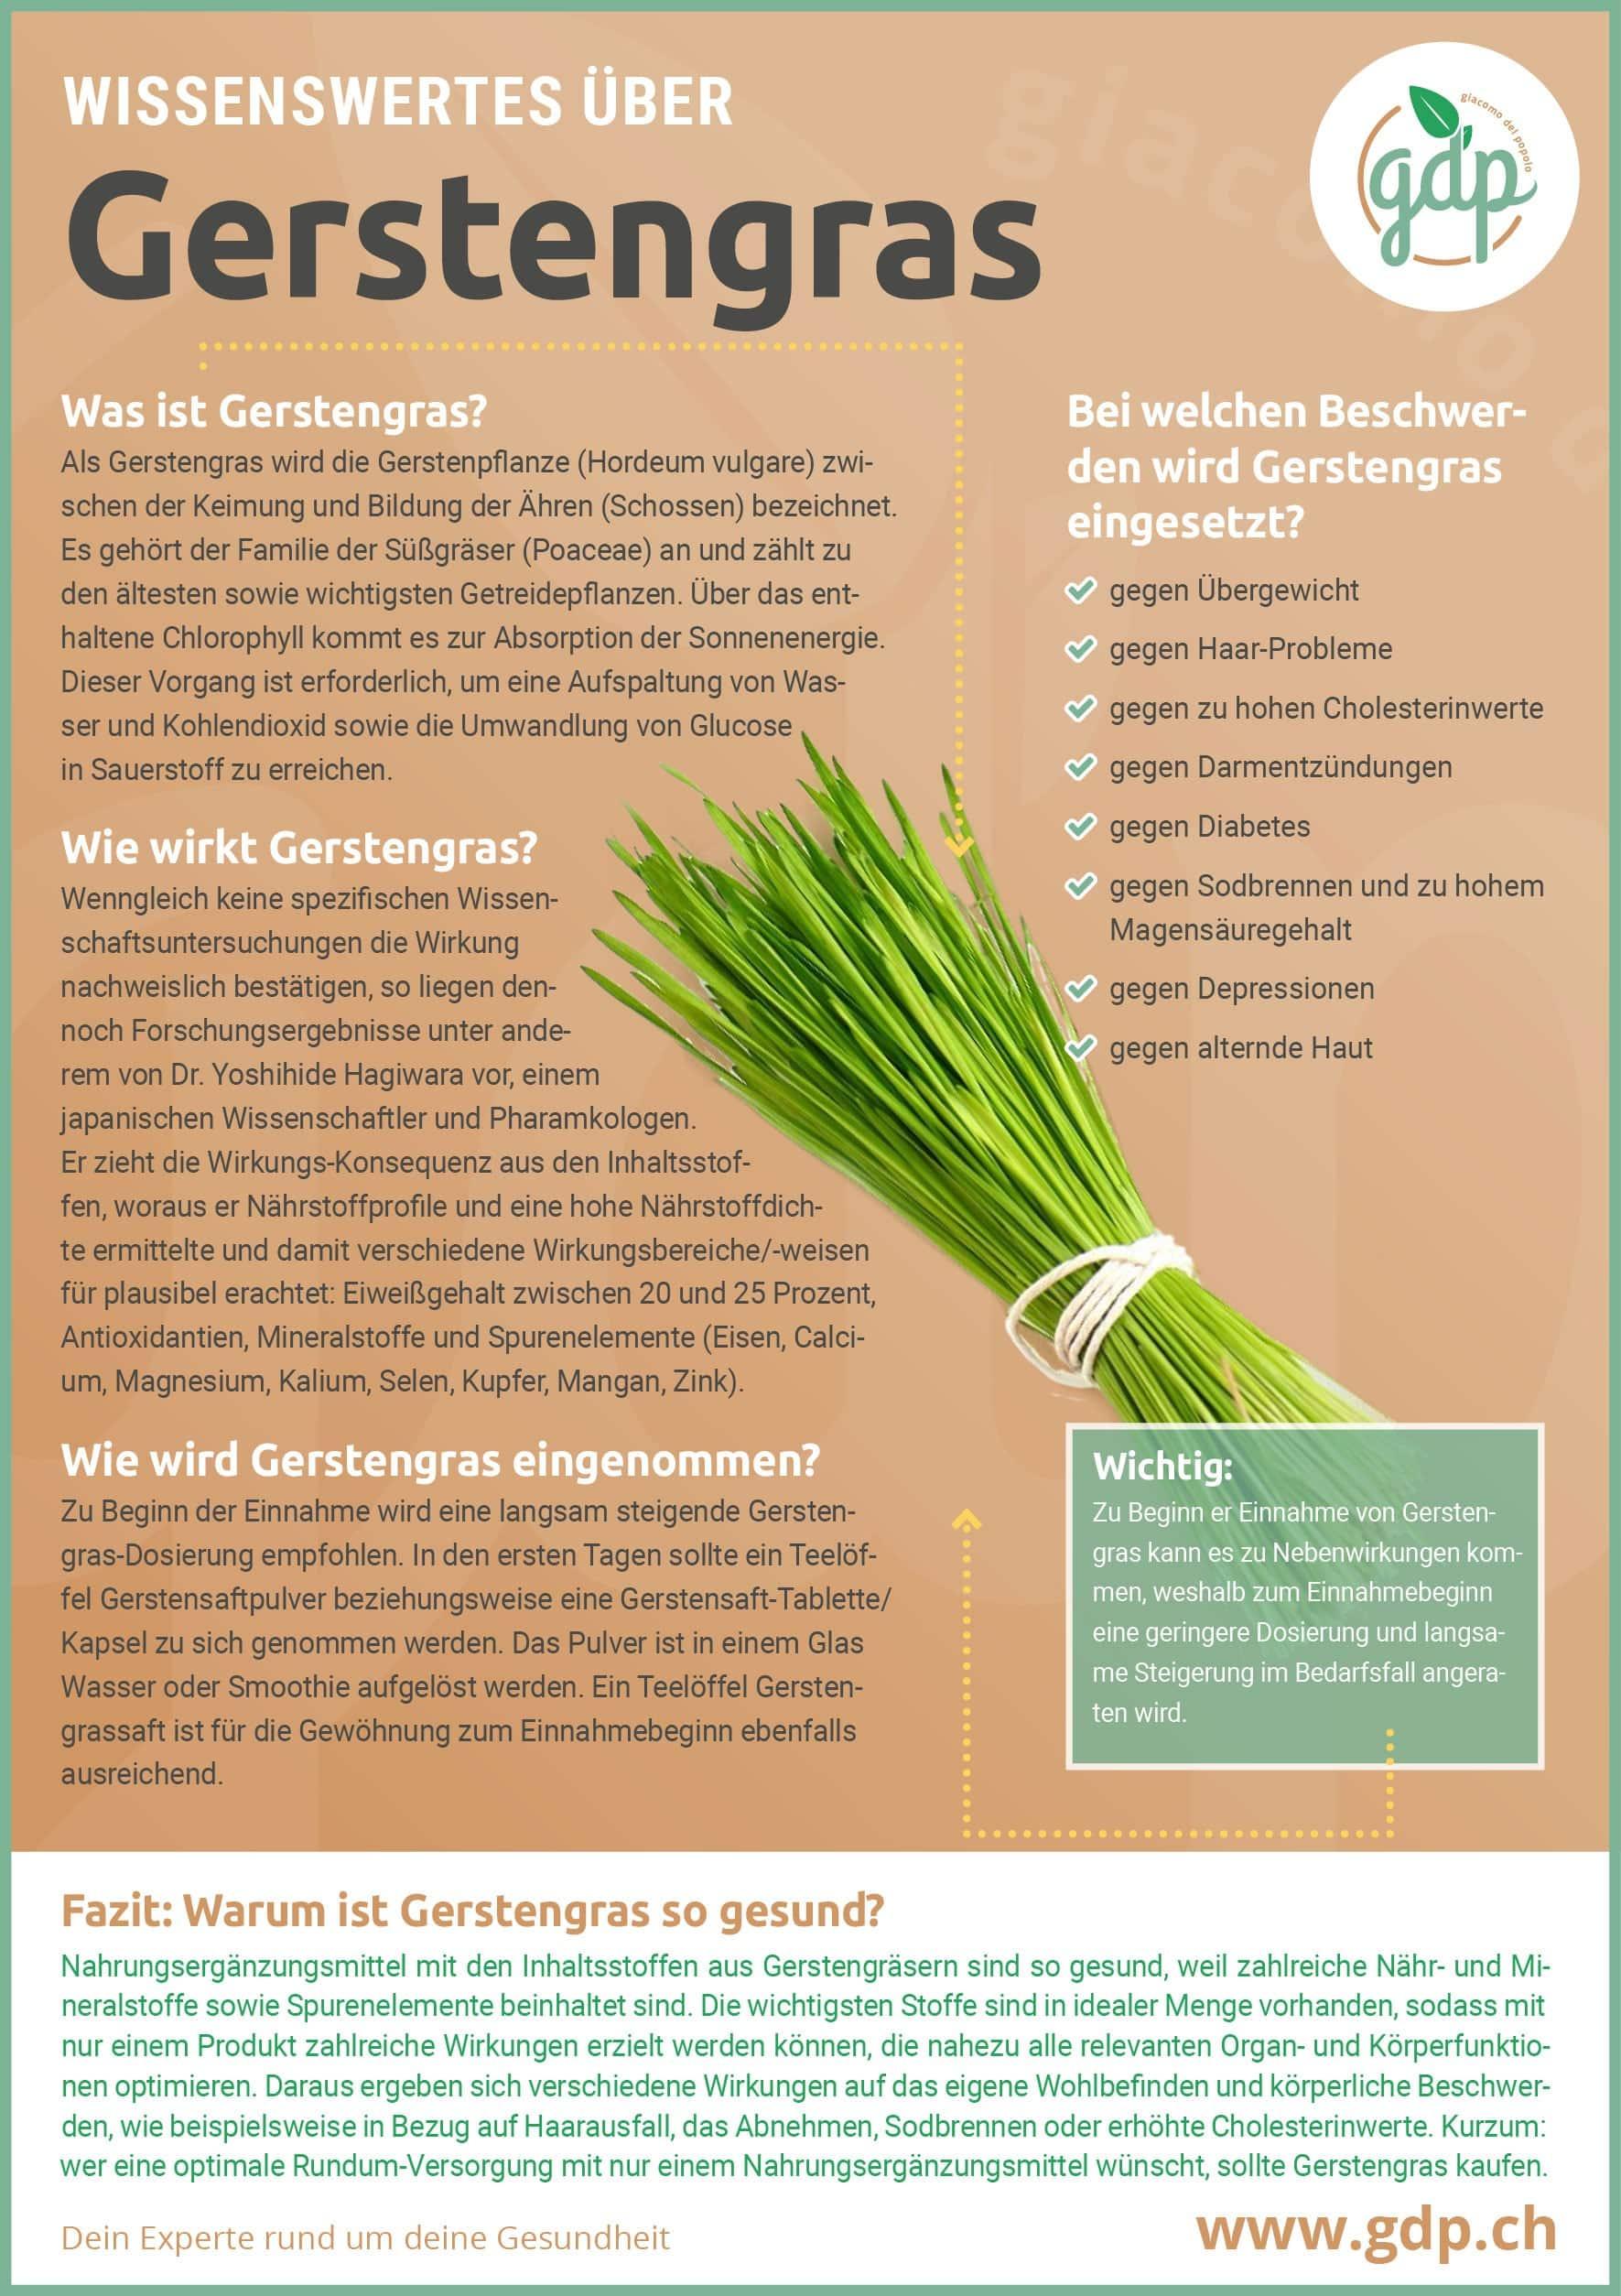 gerstengras gdp infografik